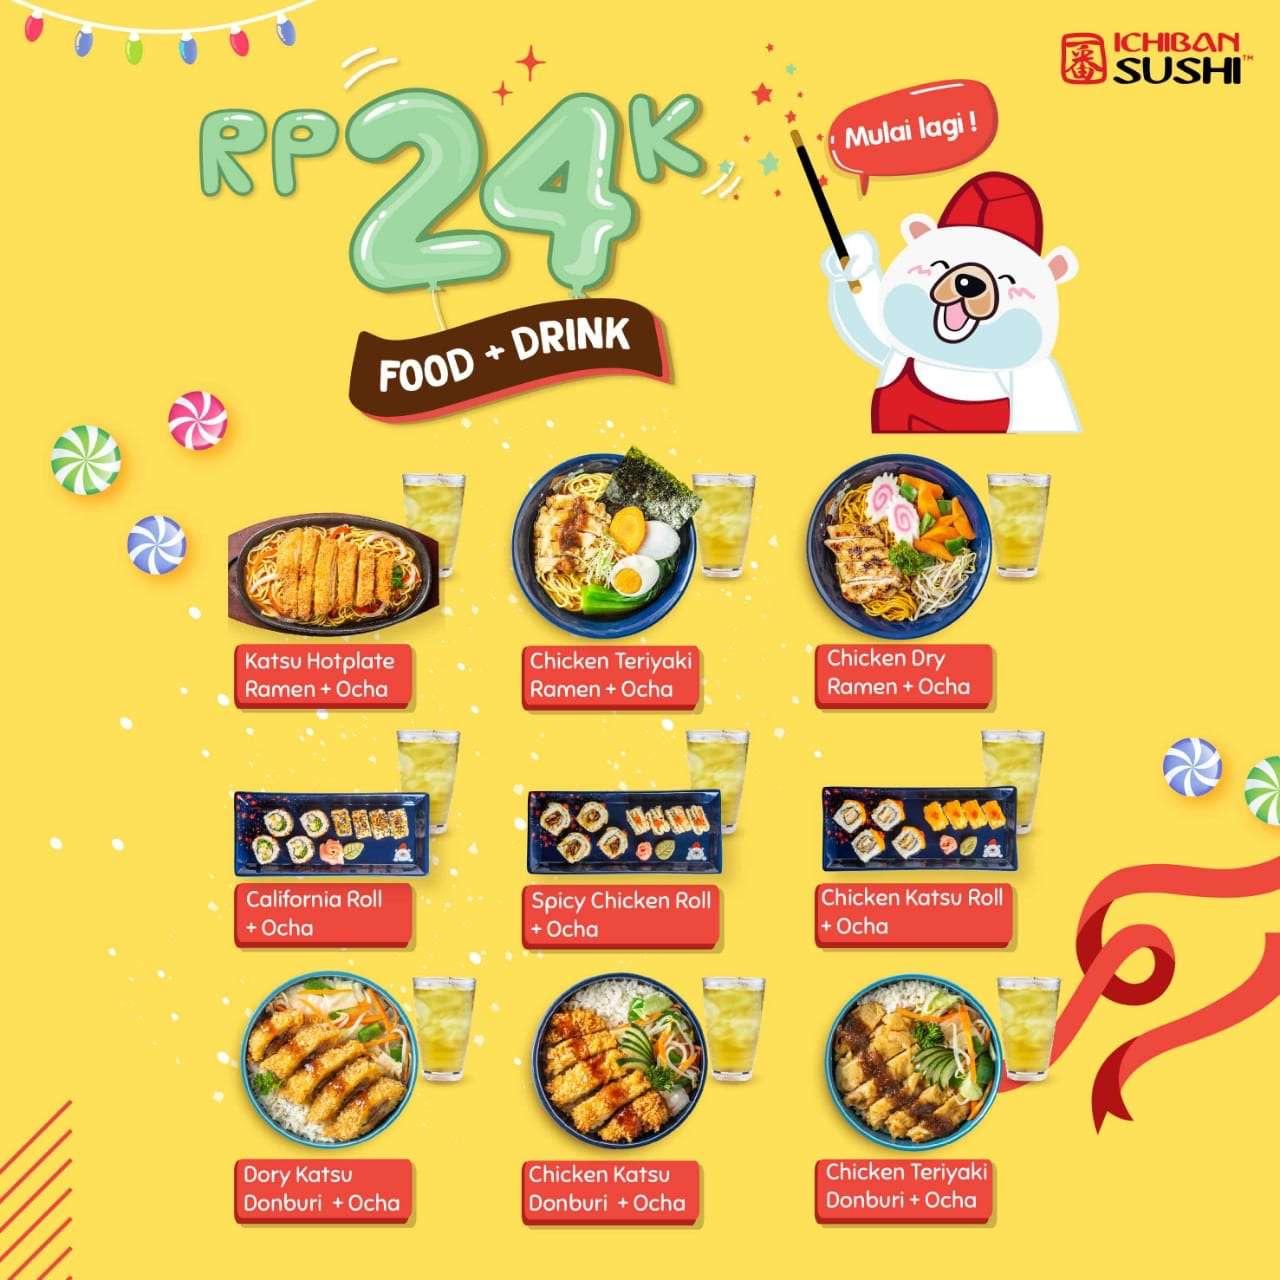 Ichiban Sushi Promo Spesial Paket Makan + Minum hanya Rp. 24.000 saja